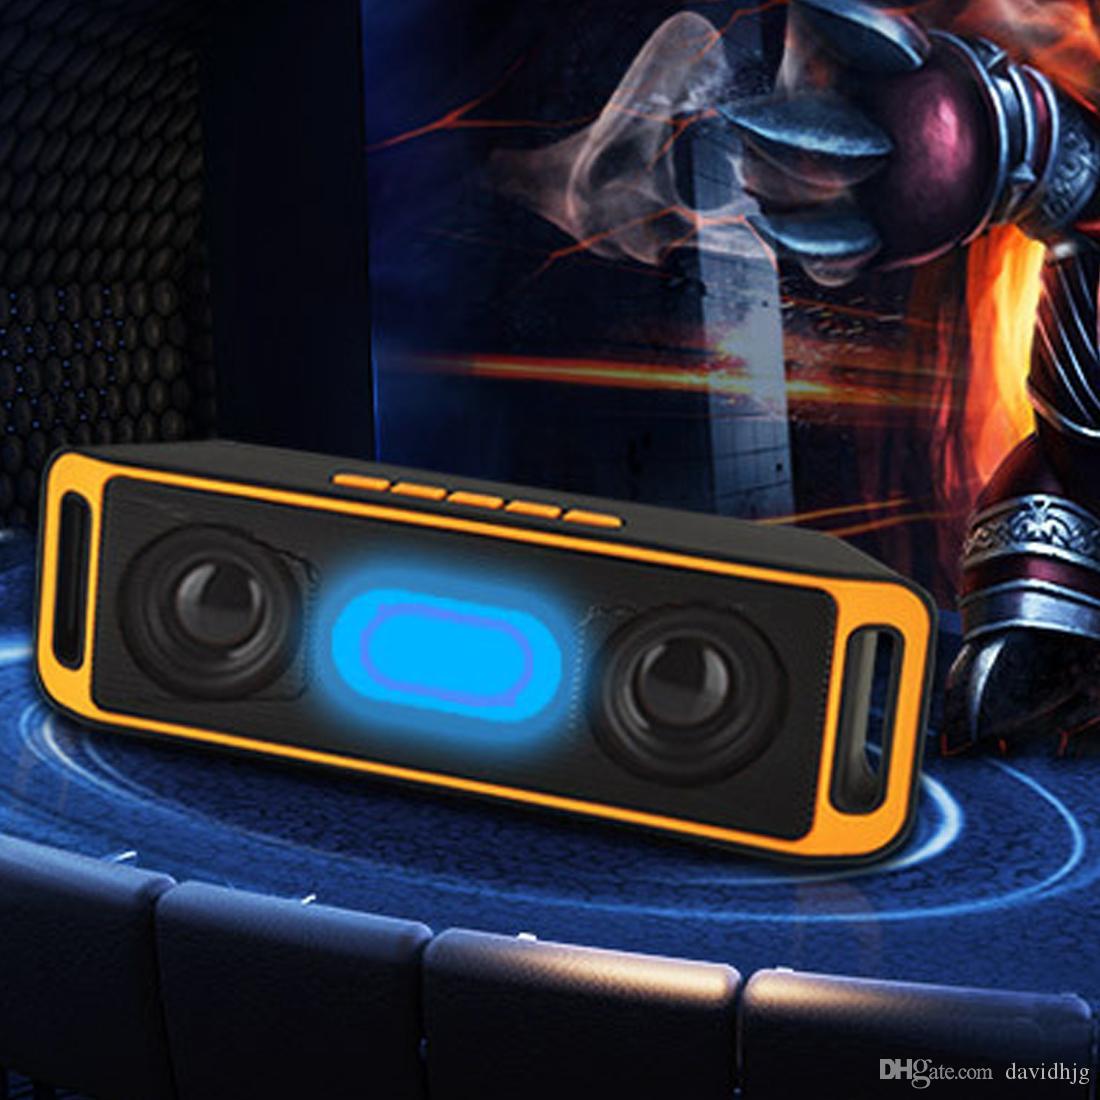 SC208 سوبر باس صوت المتكلم بلوتوث portatile ستيريو سينزا فيلي مضخم الصوت tf usb fm راديو radiocan رابط لكل ايل telefono forhuawei